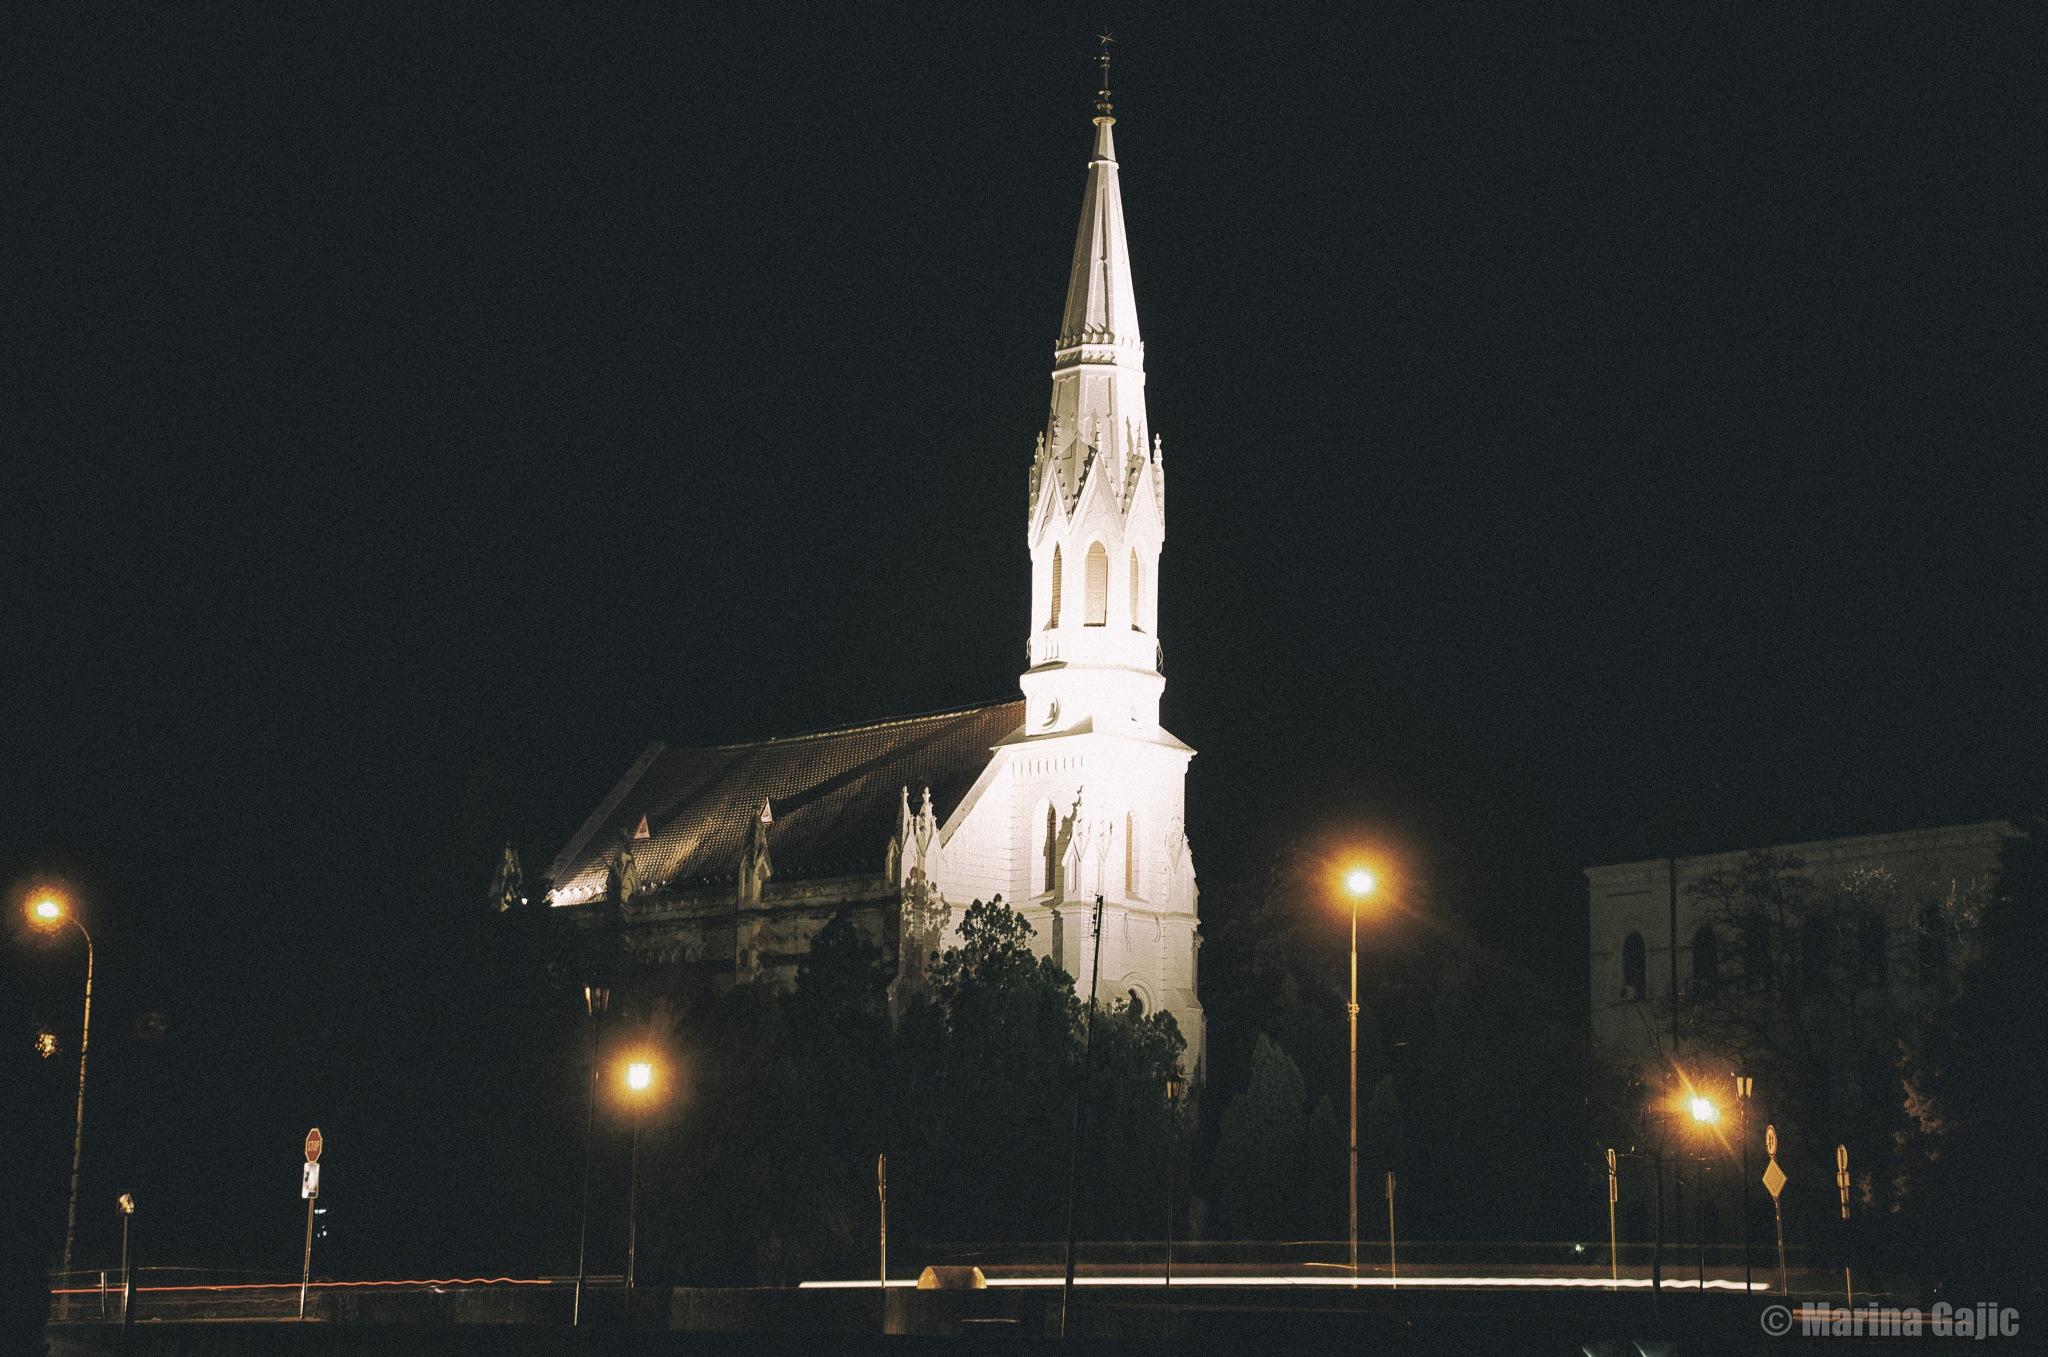 Night by Marina Gajic